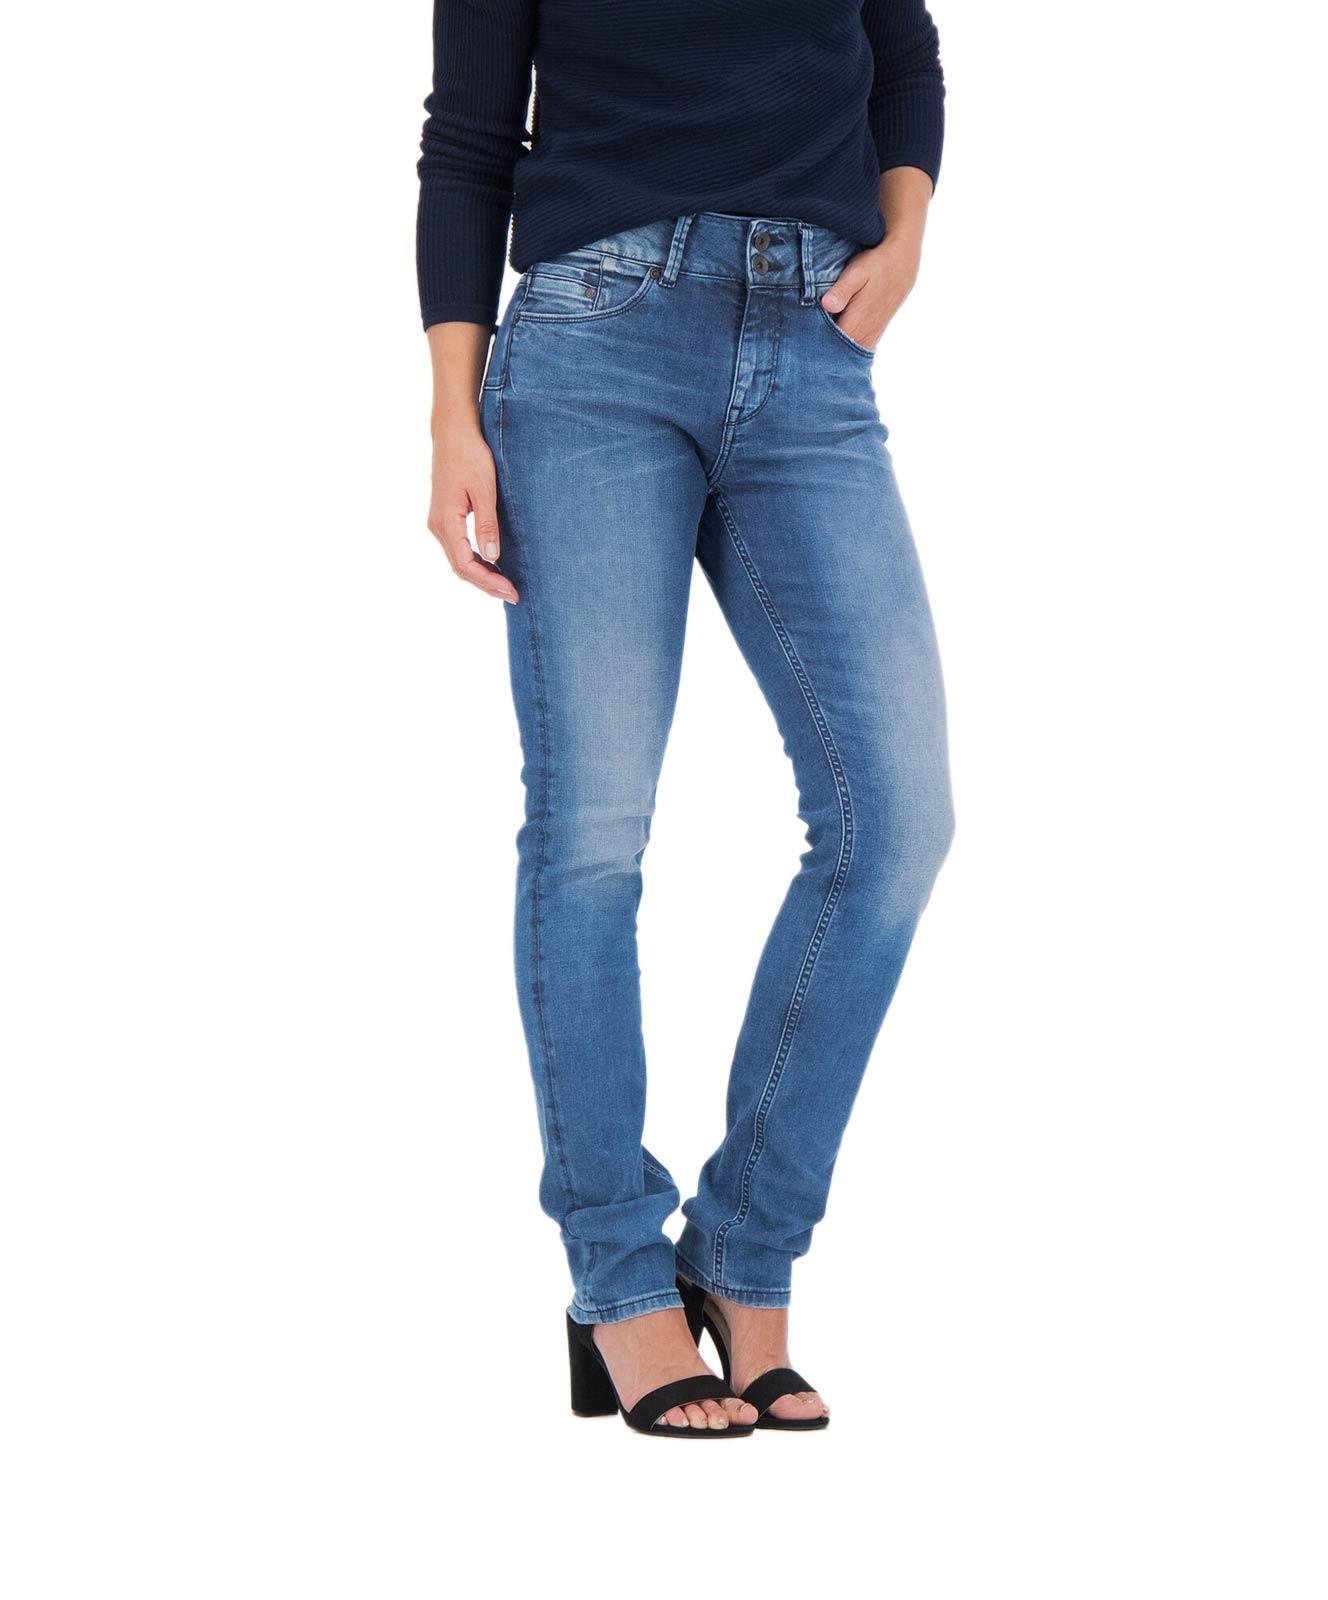 Hosen - Garcia Mom Jeans Caro Curved in Dark Used  - Onlineshop Jeans Meile